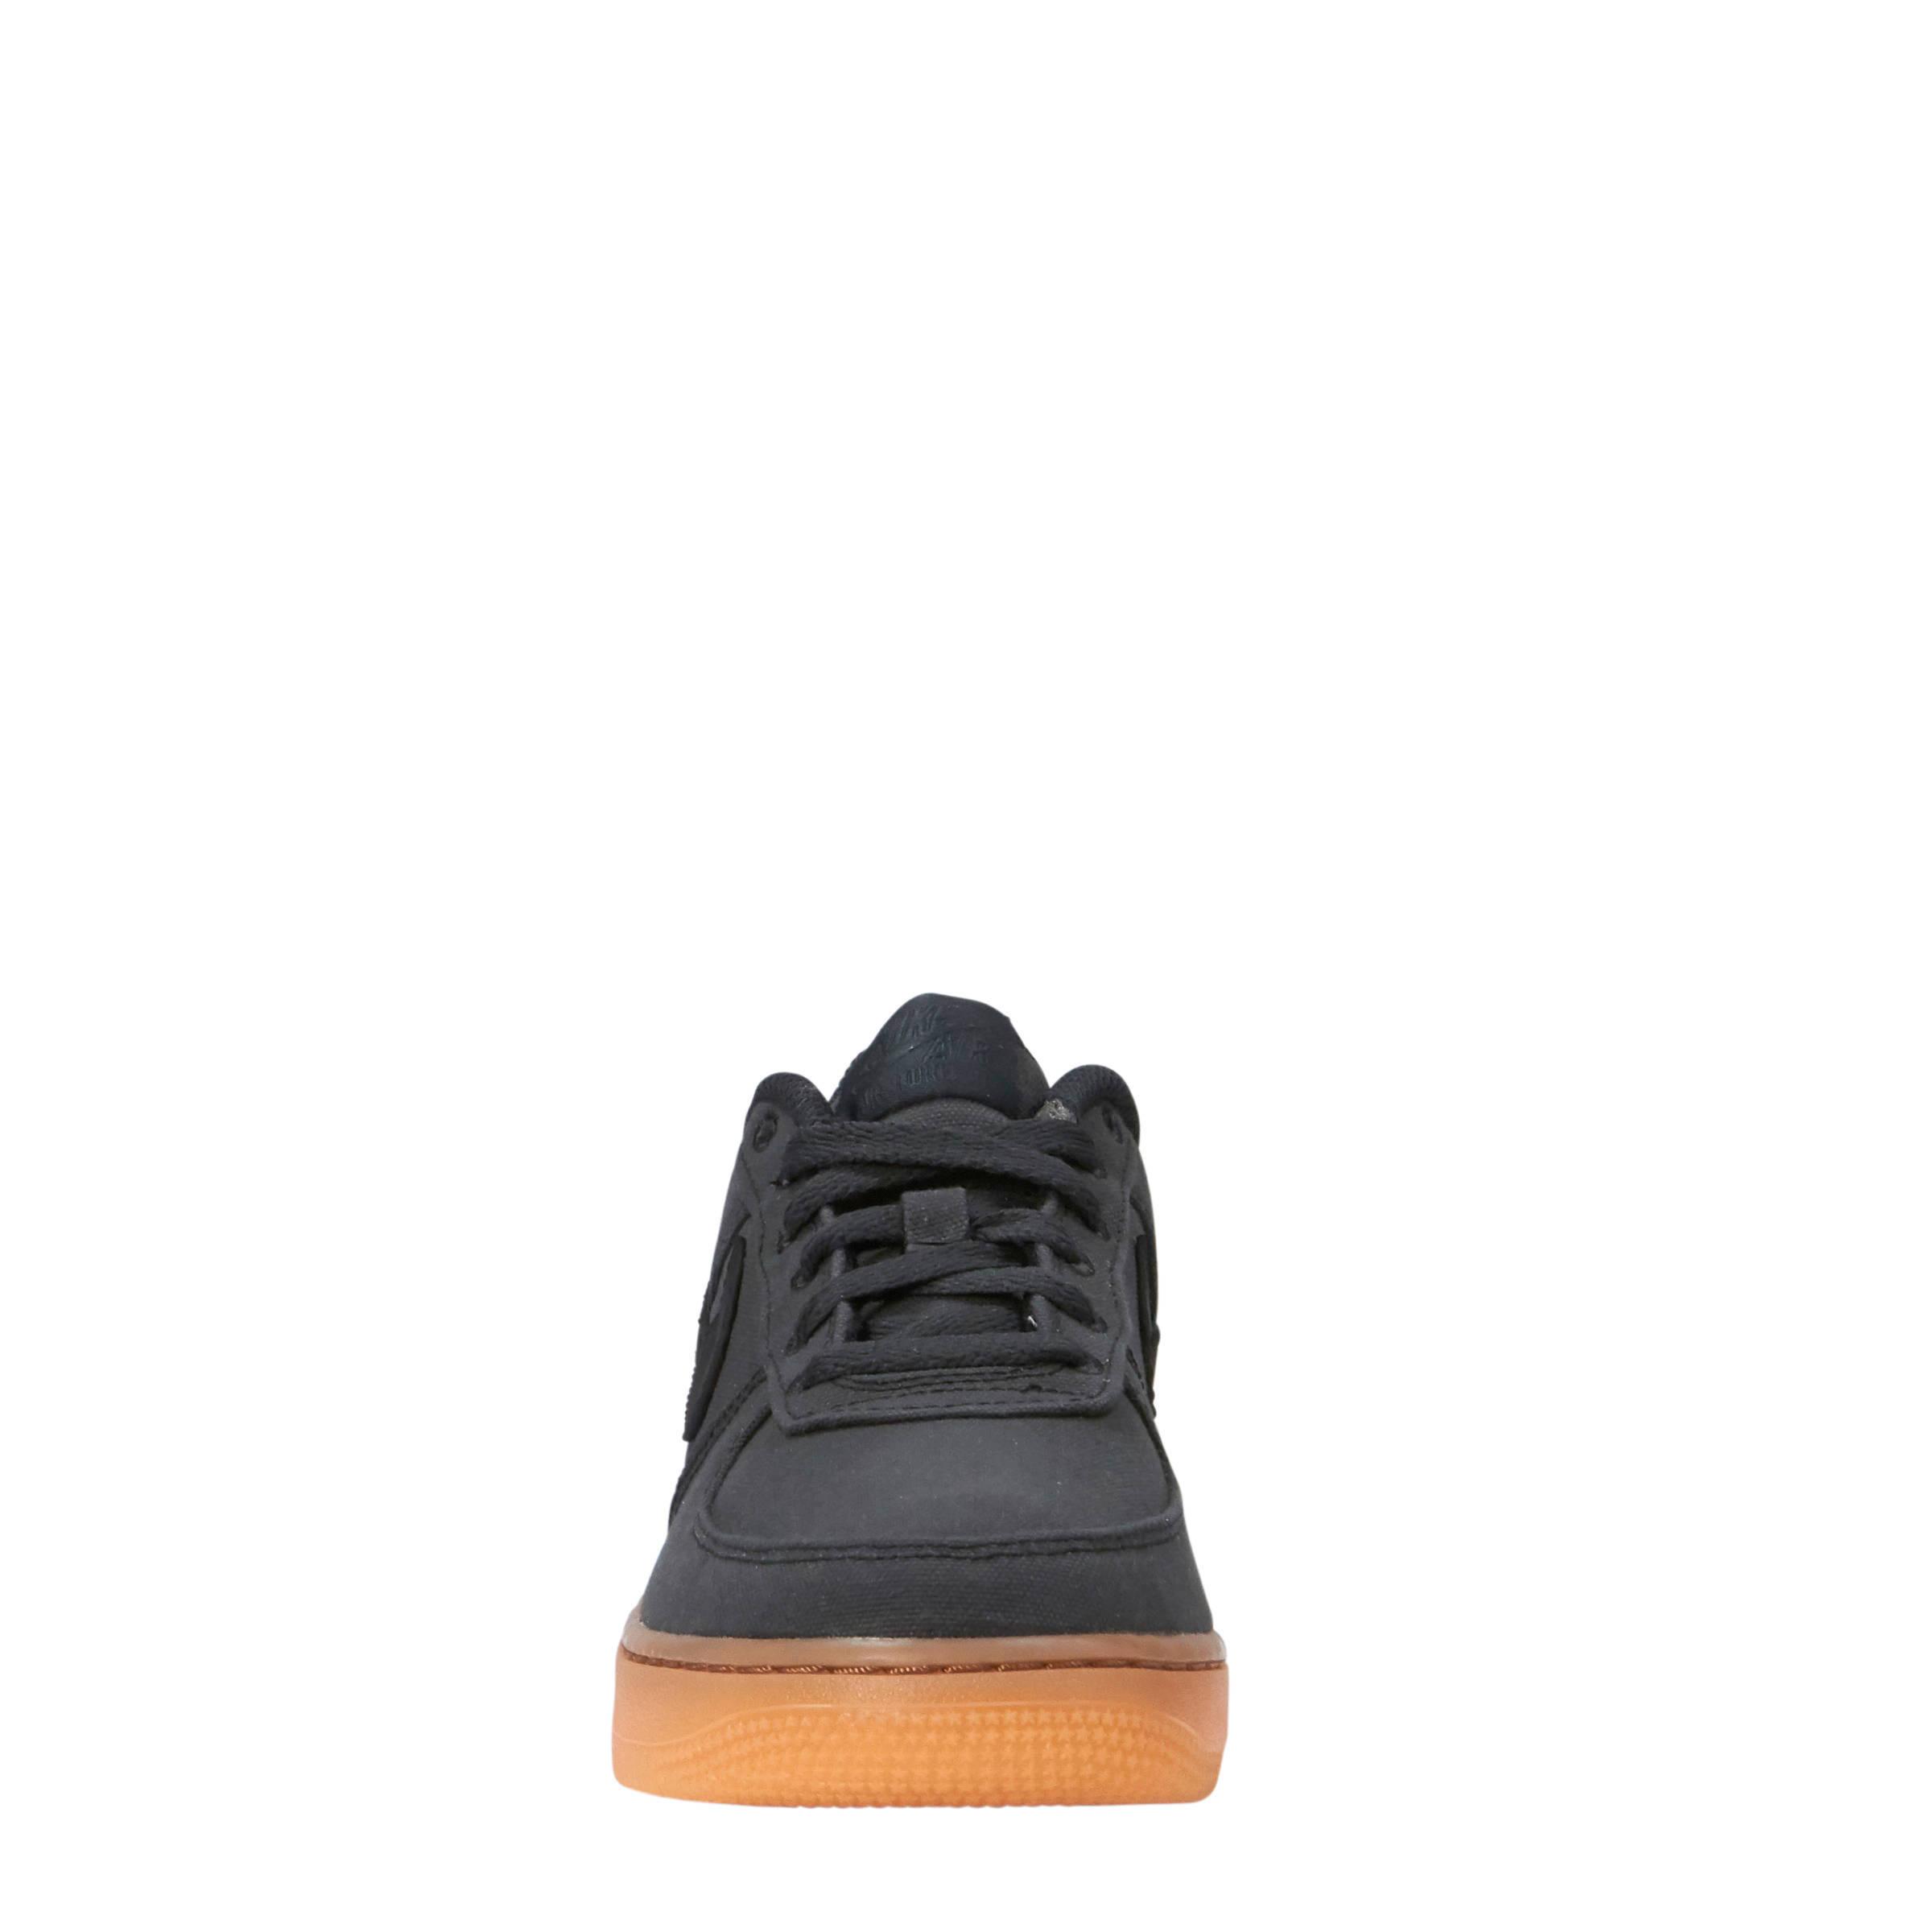 439aaf0f358 Nike sneaker Air Force 1 LV8 Style antraciet   wehkamp